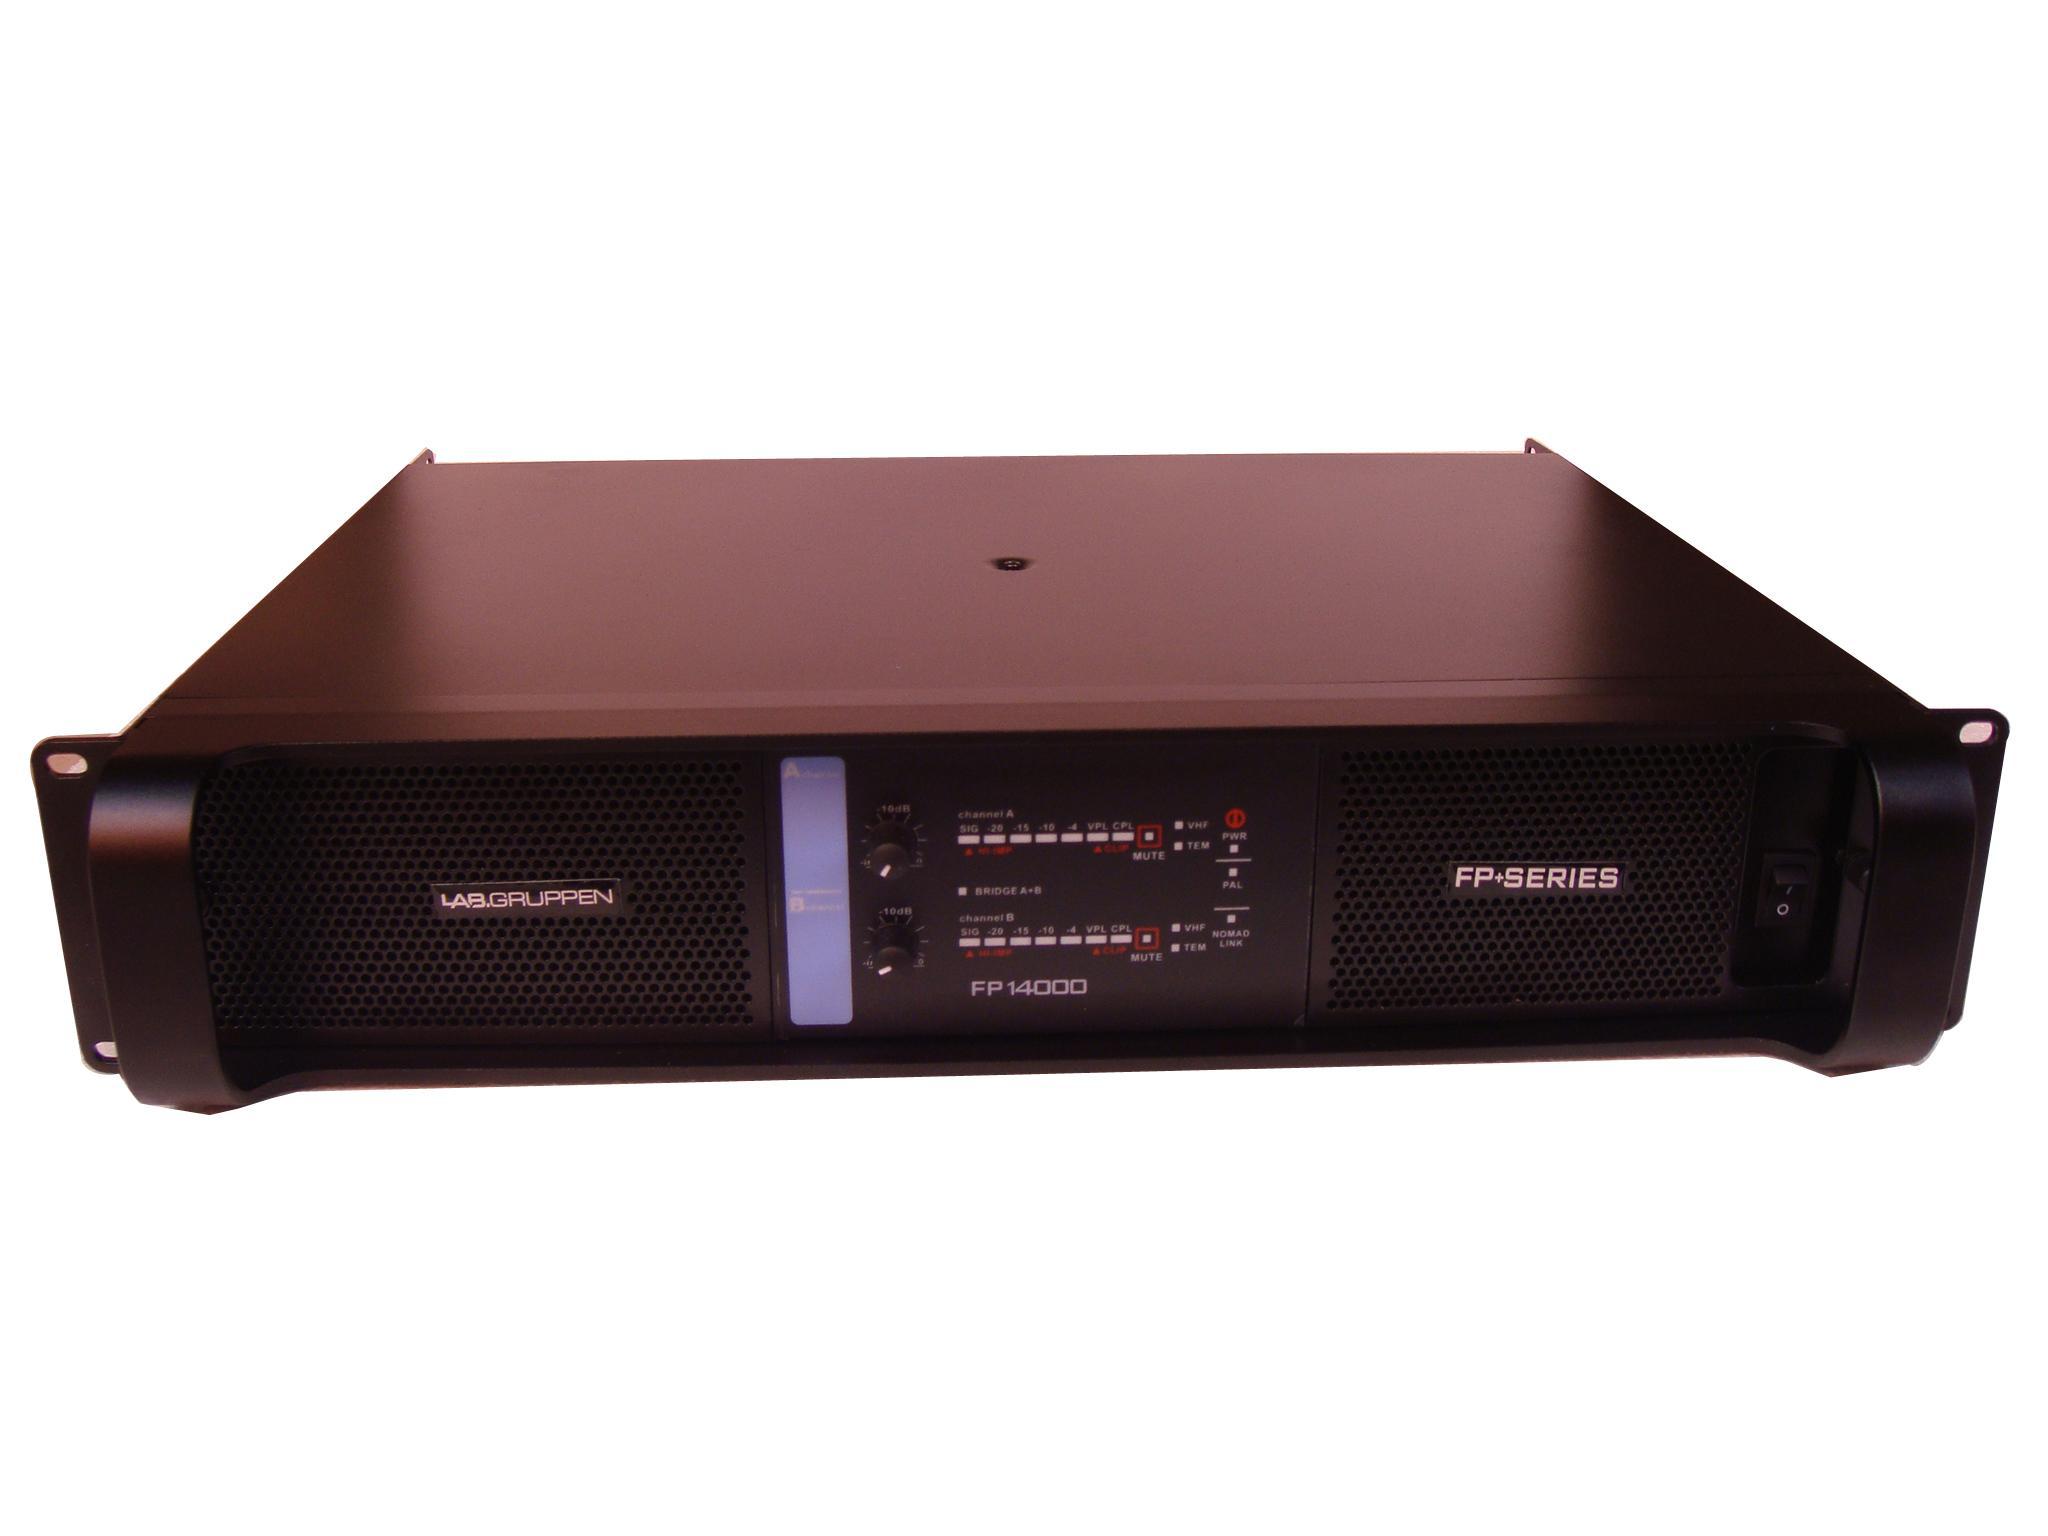 lab amplifier fp14000 new class d amplifier 2350w at 8ohms digital power amplifier professional. Black Bedroom Furniture Sets. Home Design Ideas